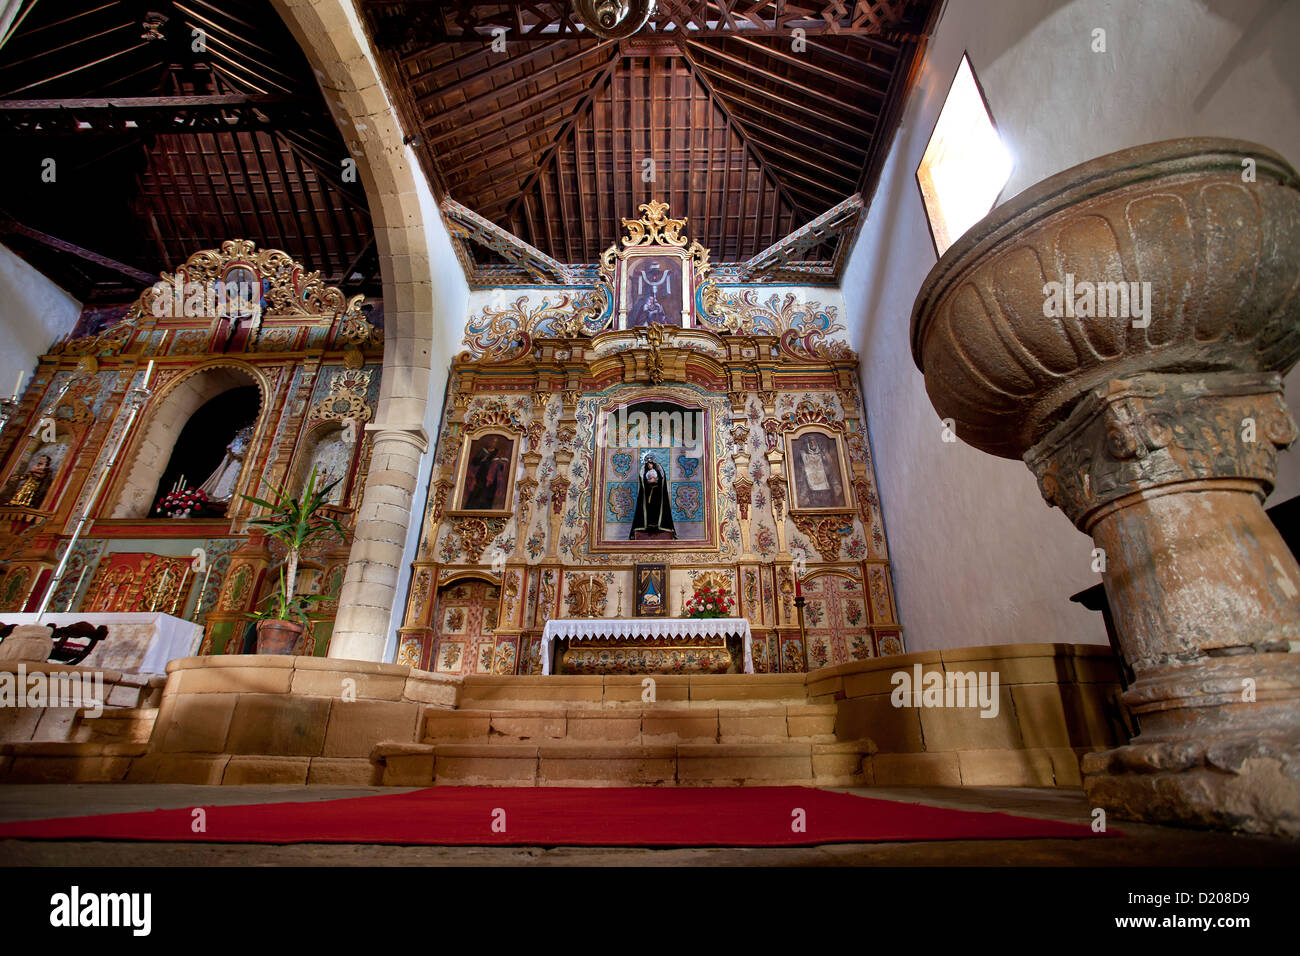 Autel, église Iglesia de Vierge de la Regla, Sotavento, Fuerteventura, Îles Canaries, Espagne Photo Stock